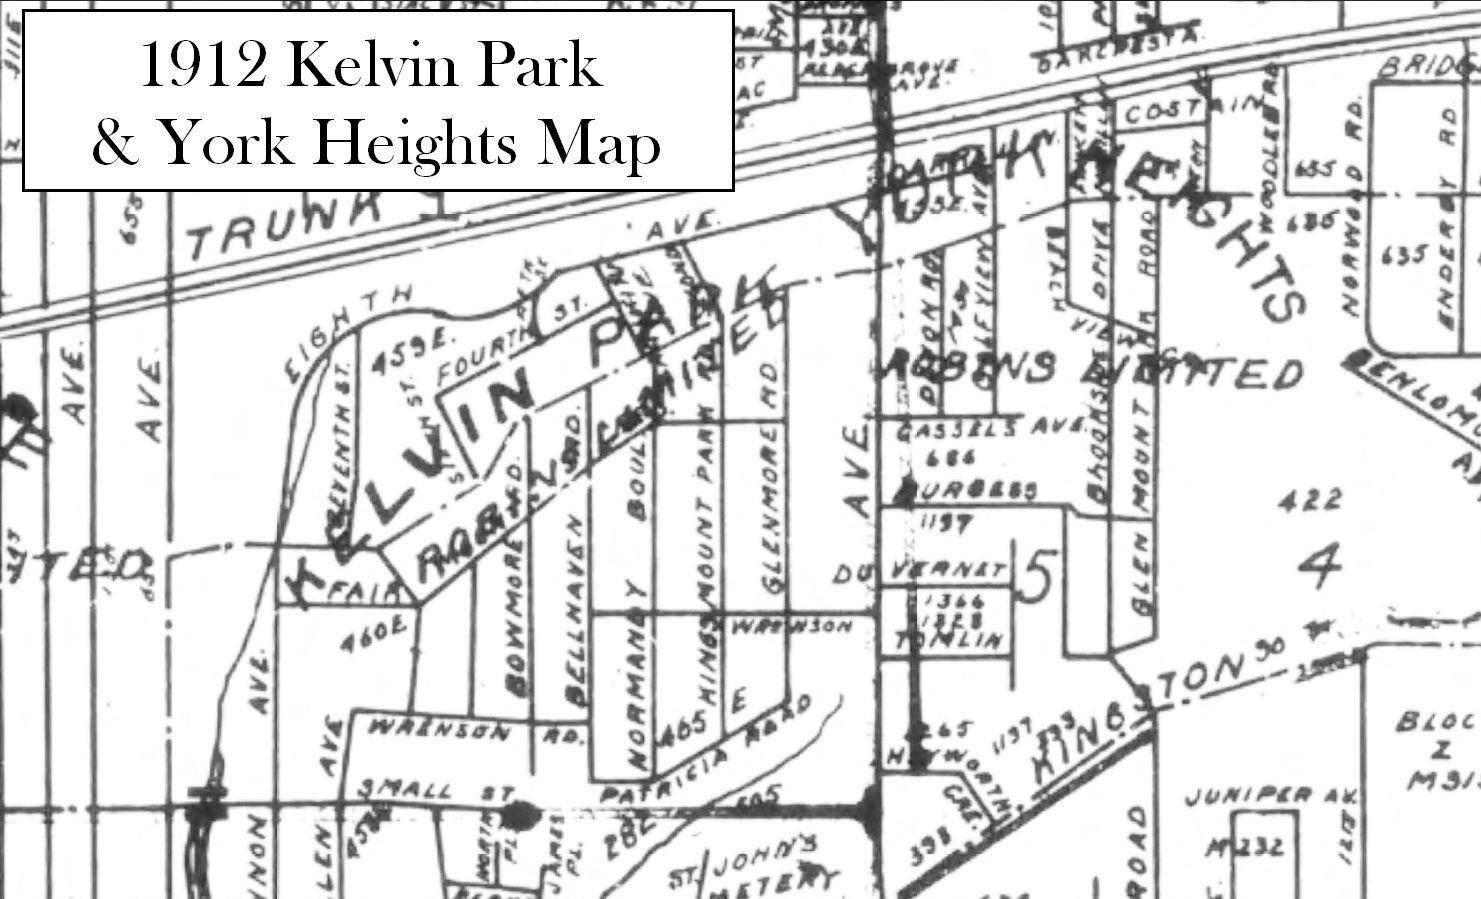 1912 Kelvin Park & York Heights Map